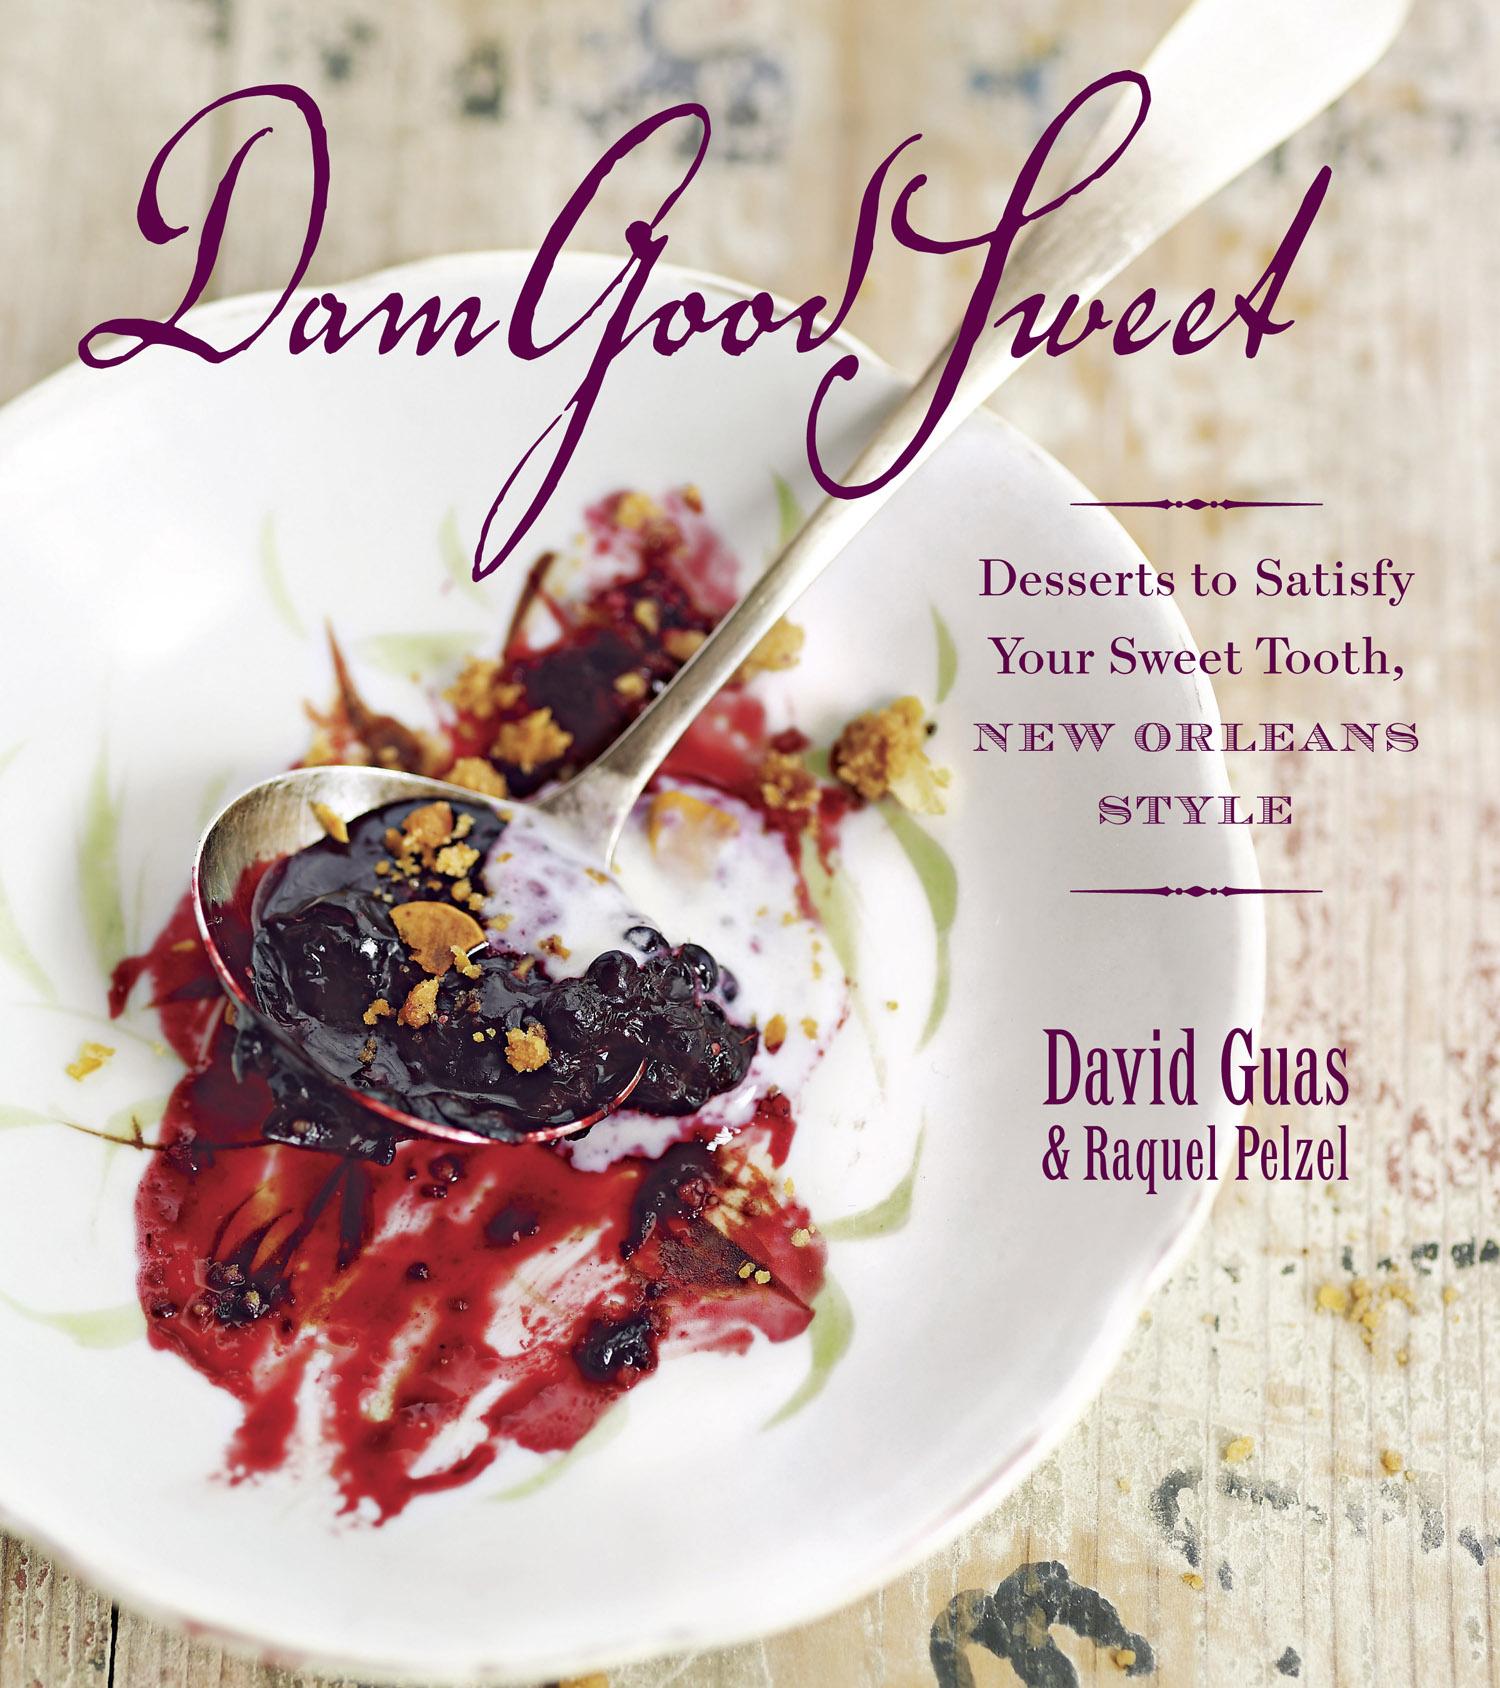 http://www.finebooksmagazine.com/fine_books_blog/images/damgoodsweet-Cover%20Only.jpg